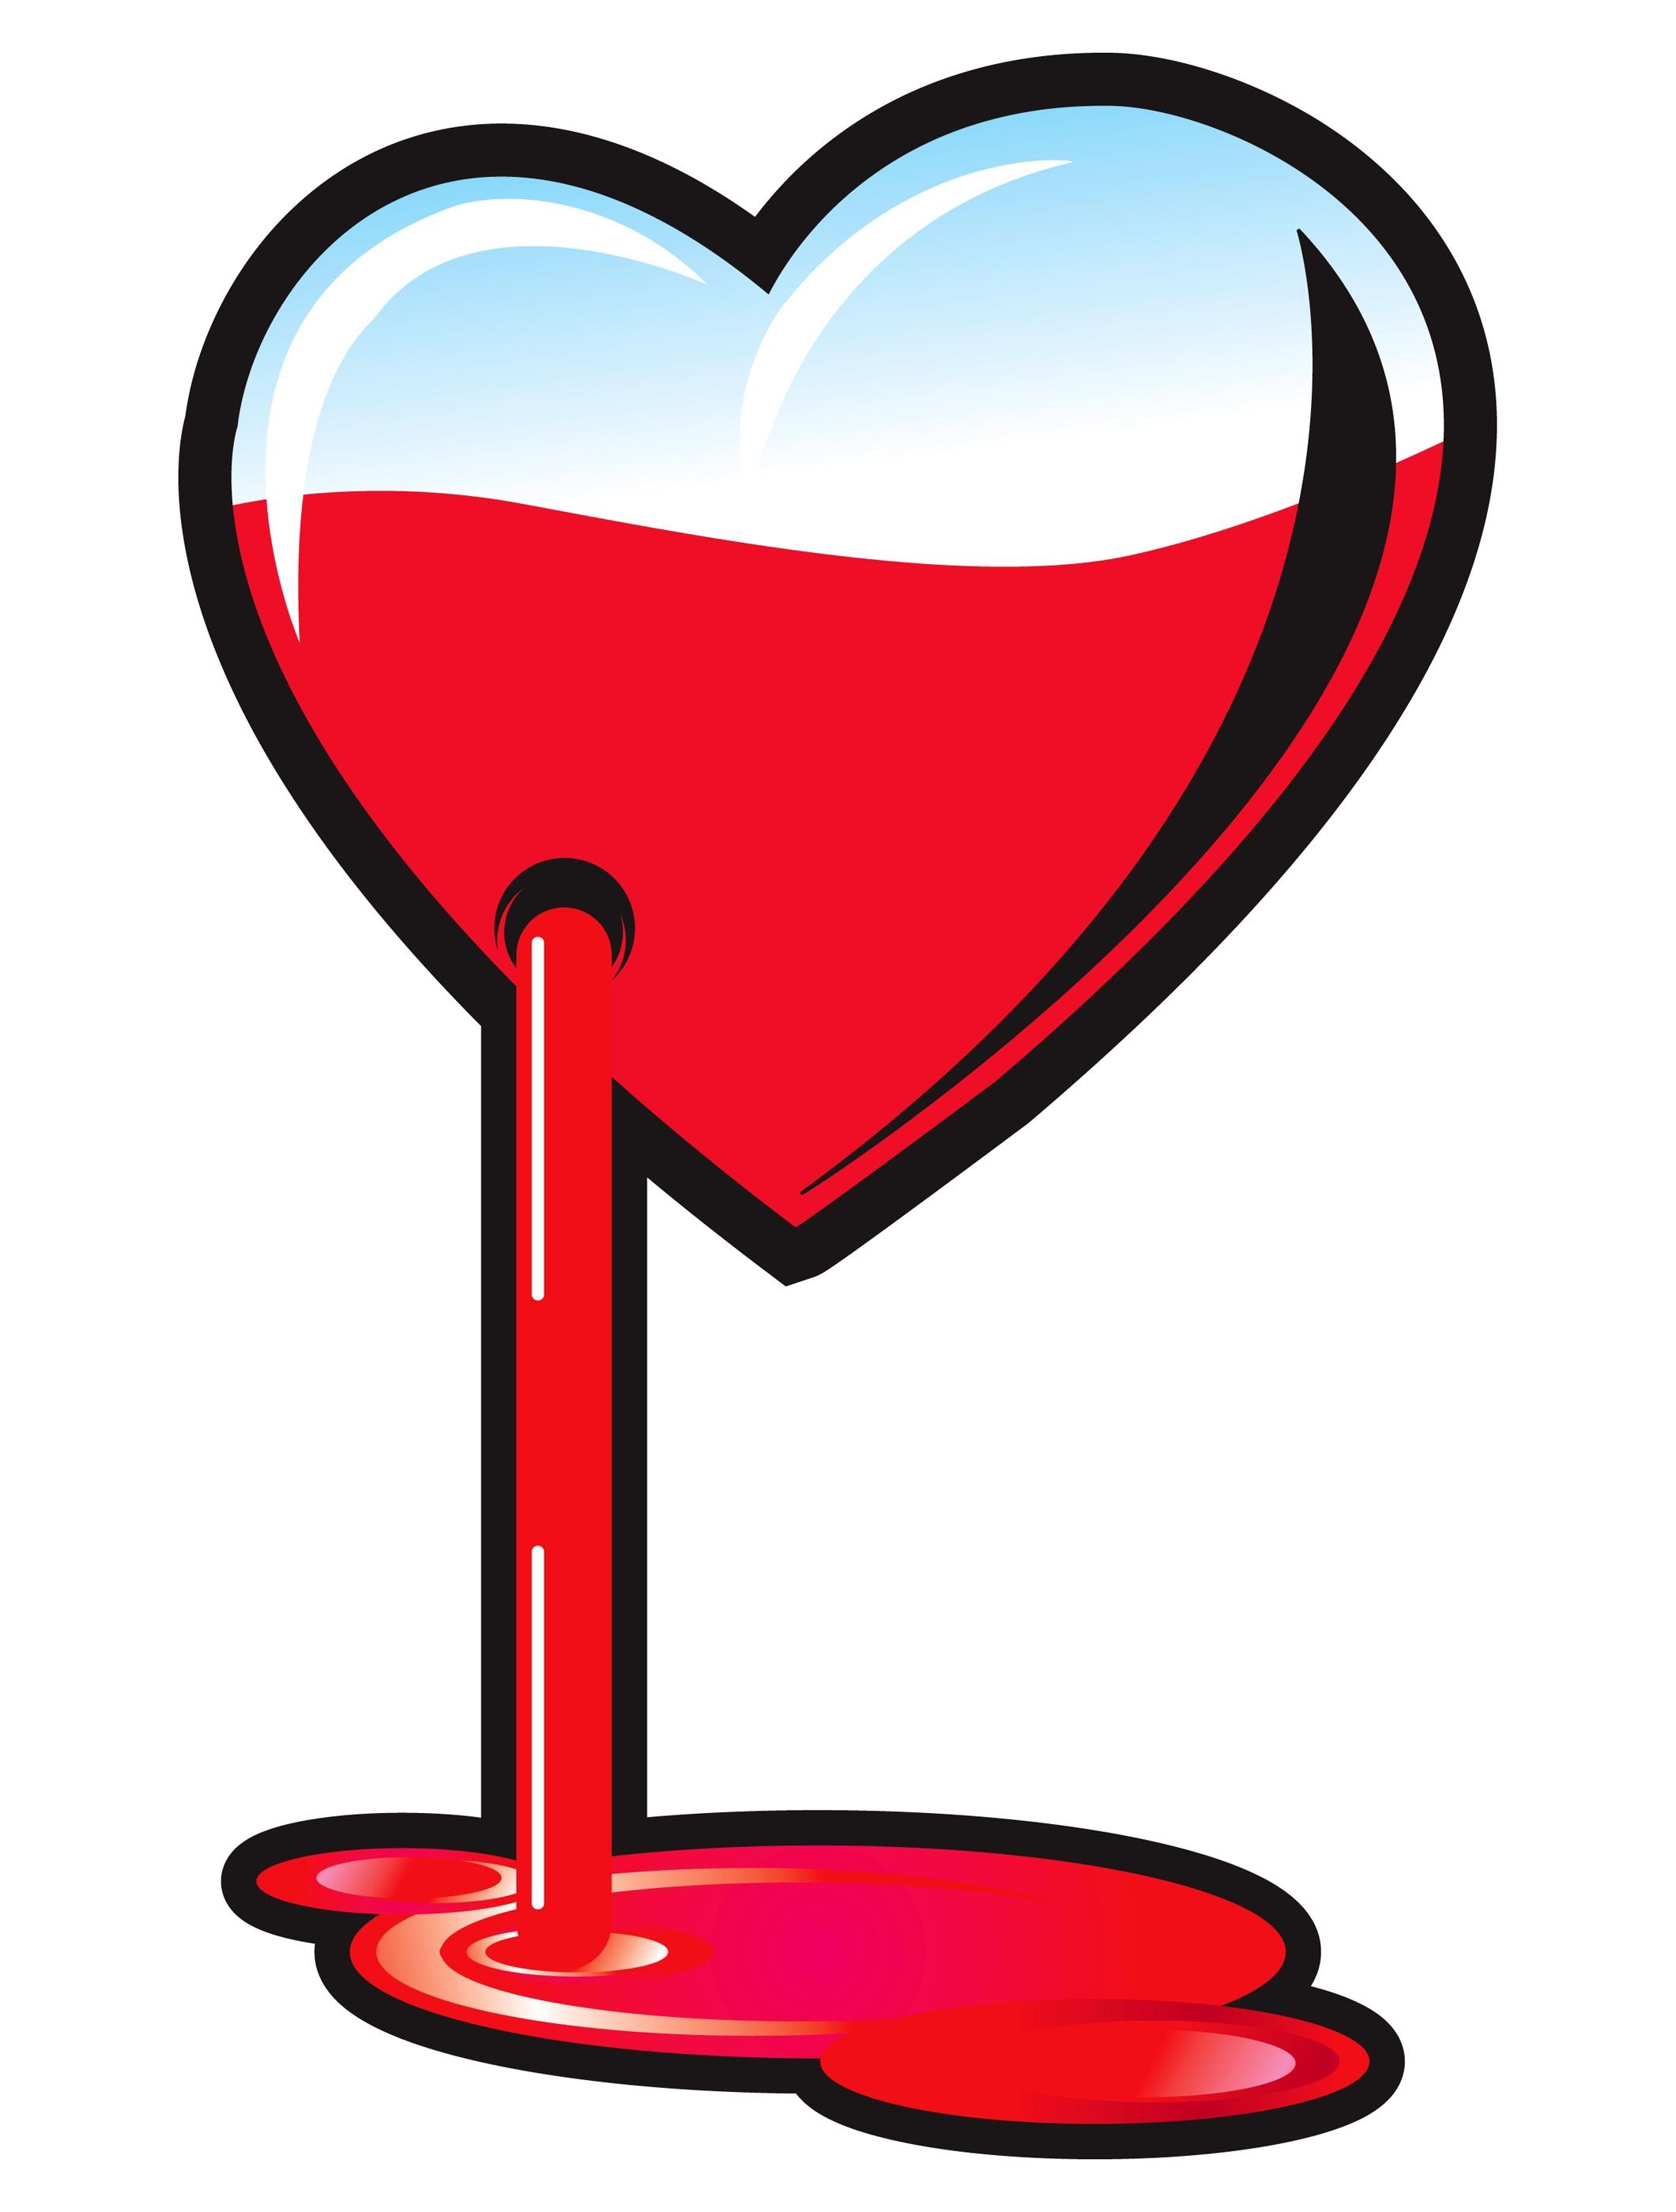 blood deficient heart.jpg